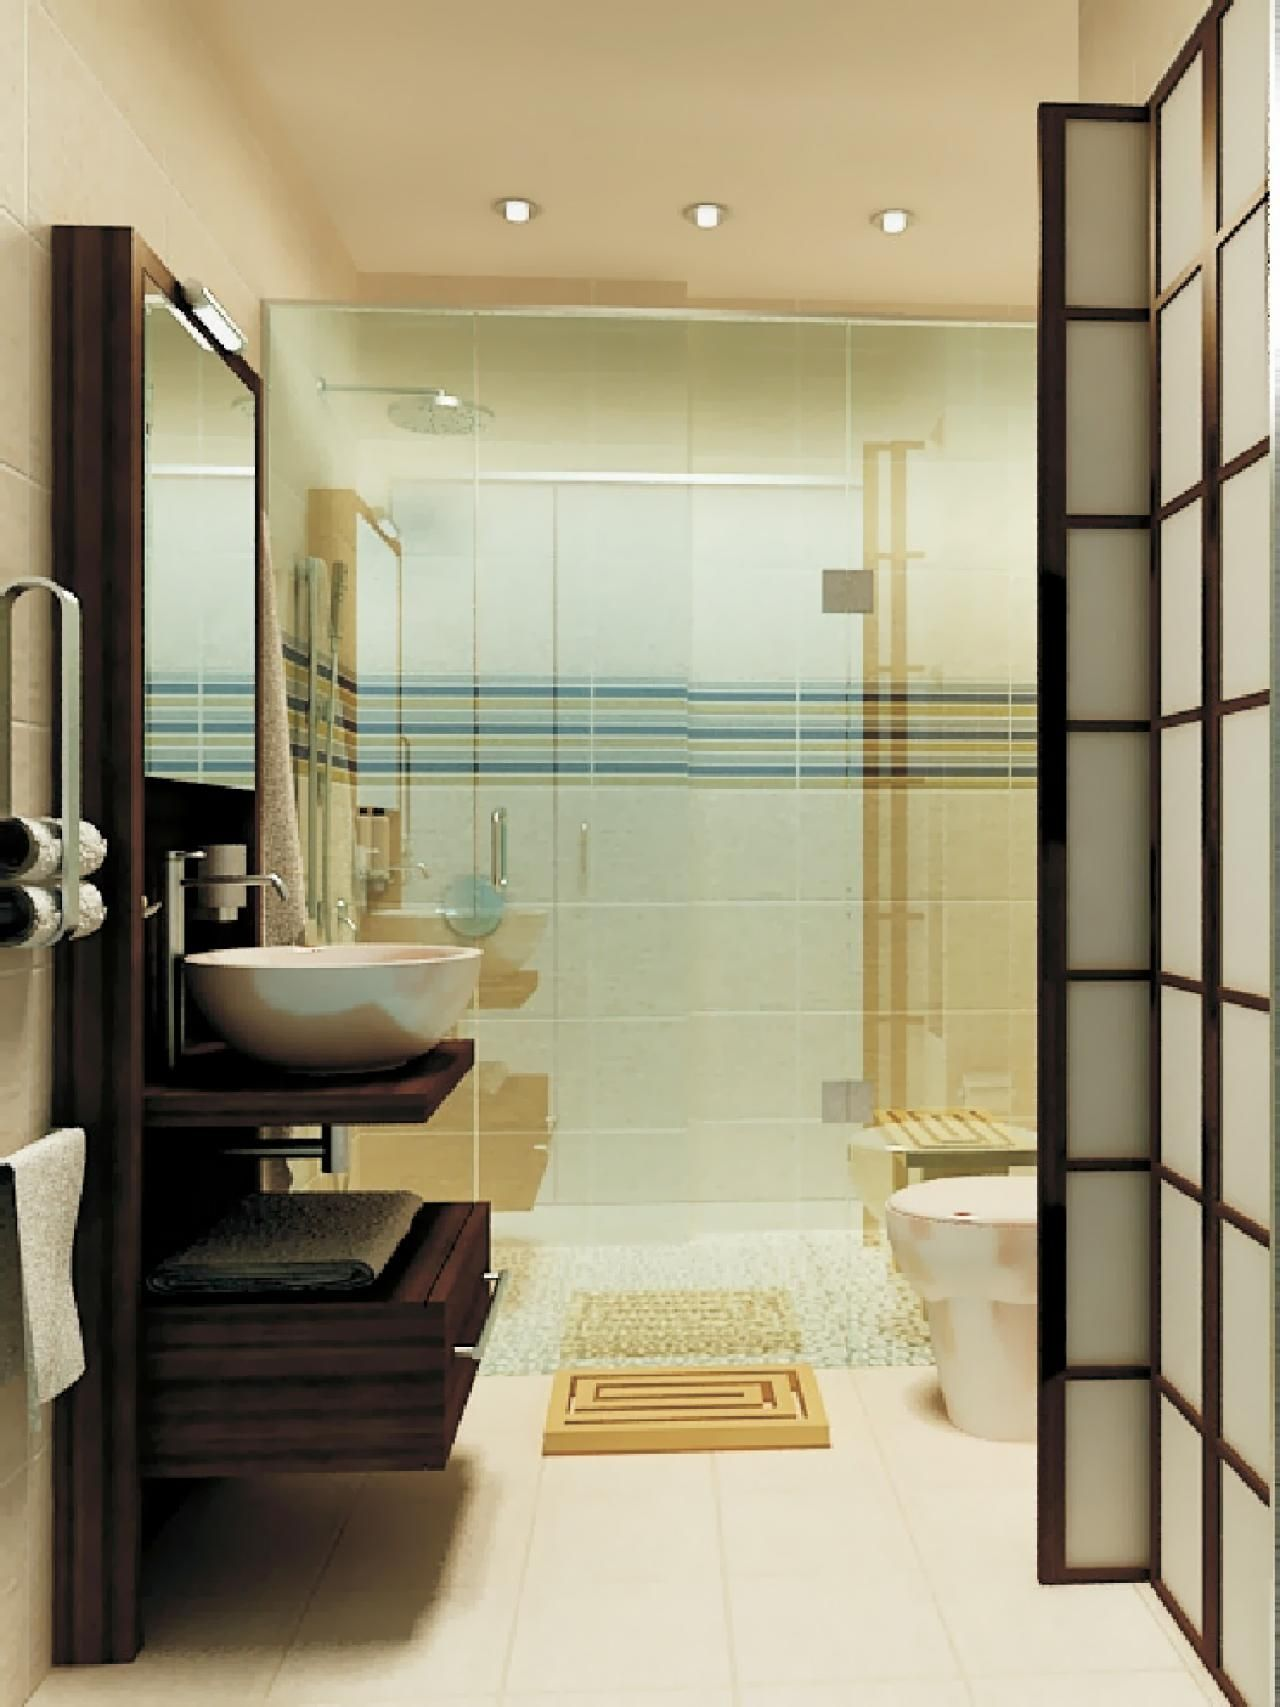 Small Bathrooms Big Design Modern Bathroom Remodel Zen Bathroom Design Small Luxury Bathrooms